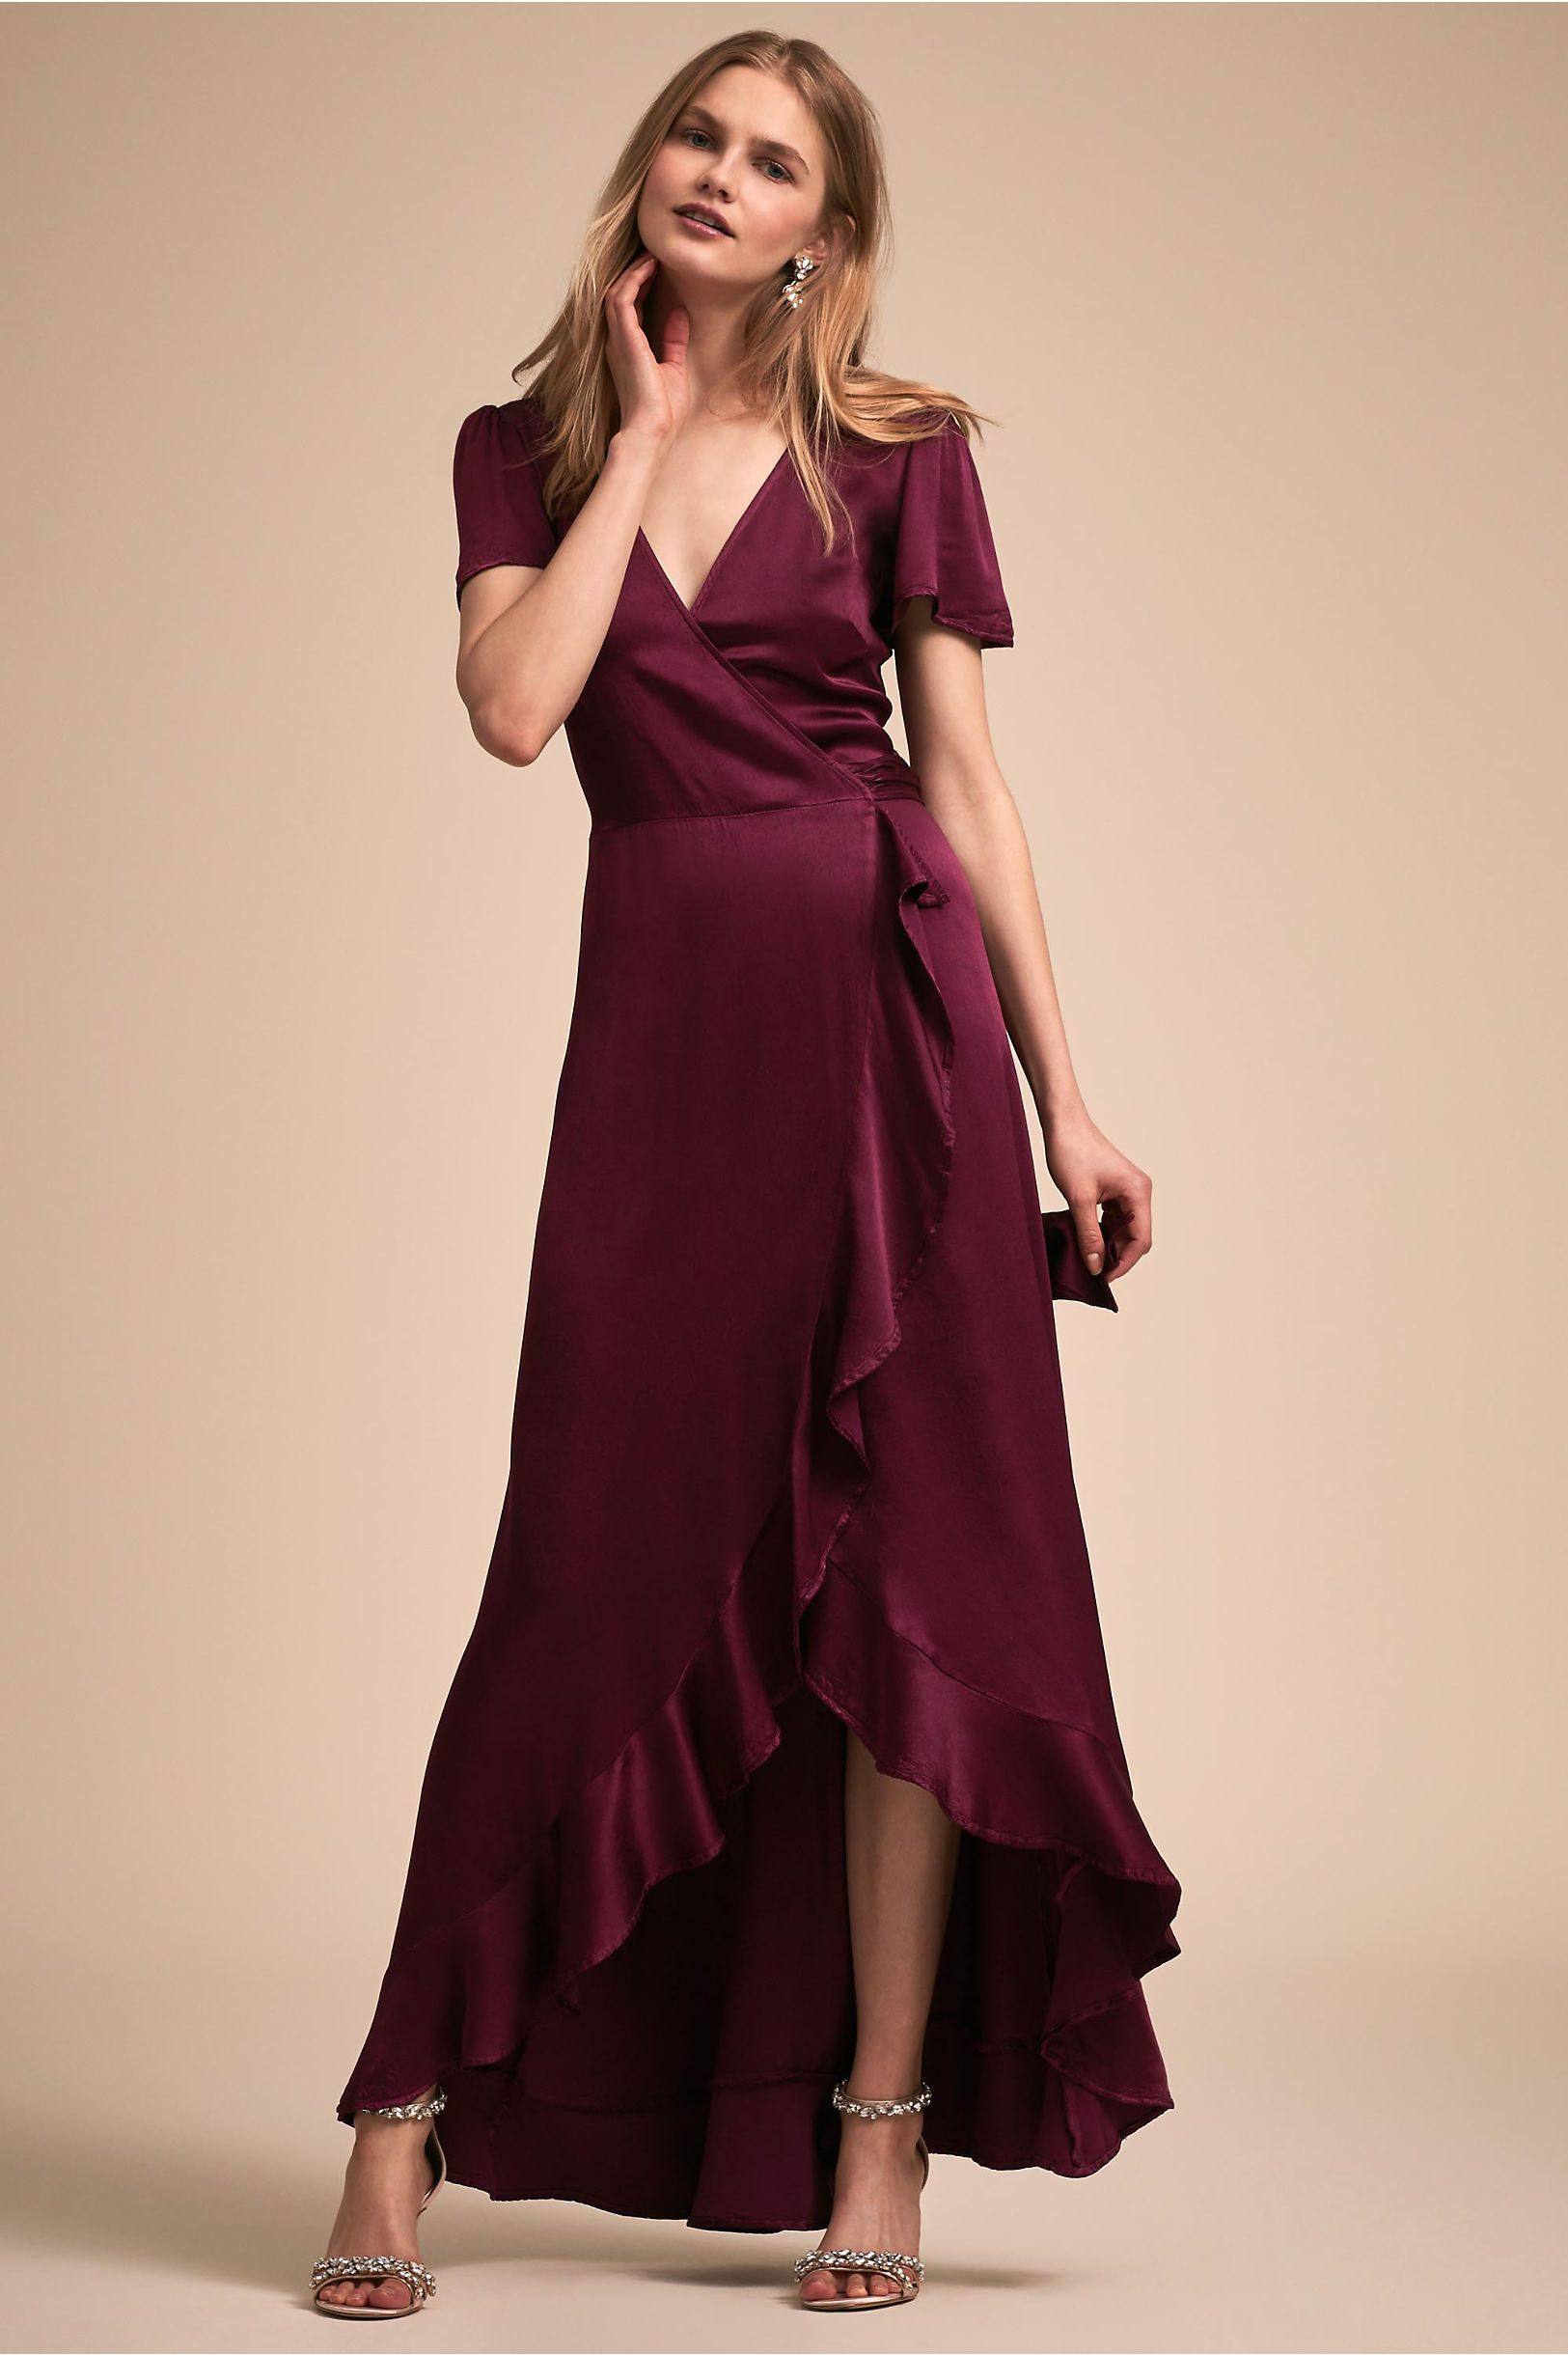 33b6cd98c37 Phoebe Dress Hydrangea in Bridal Party